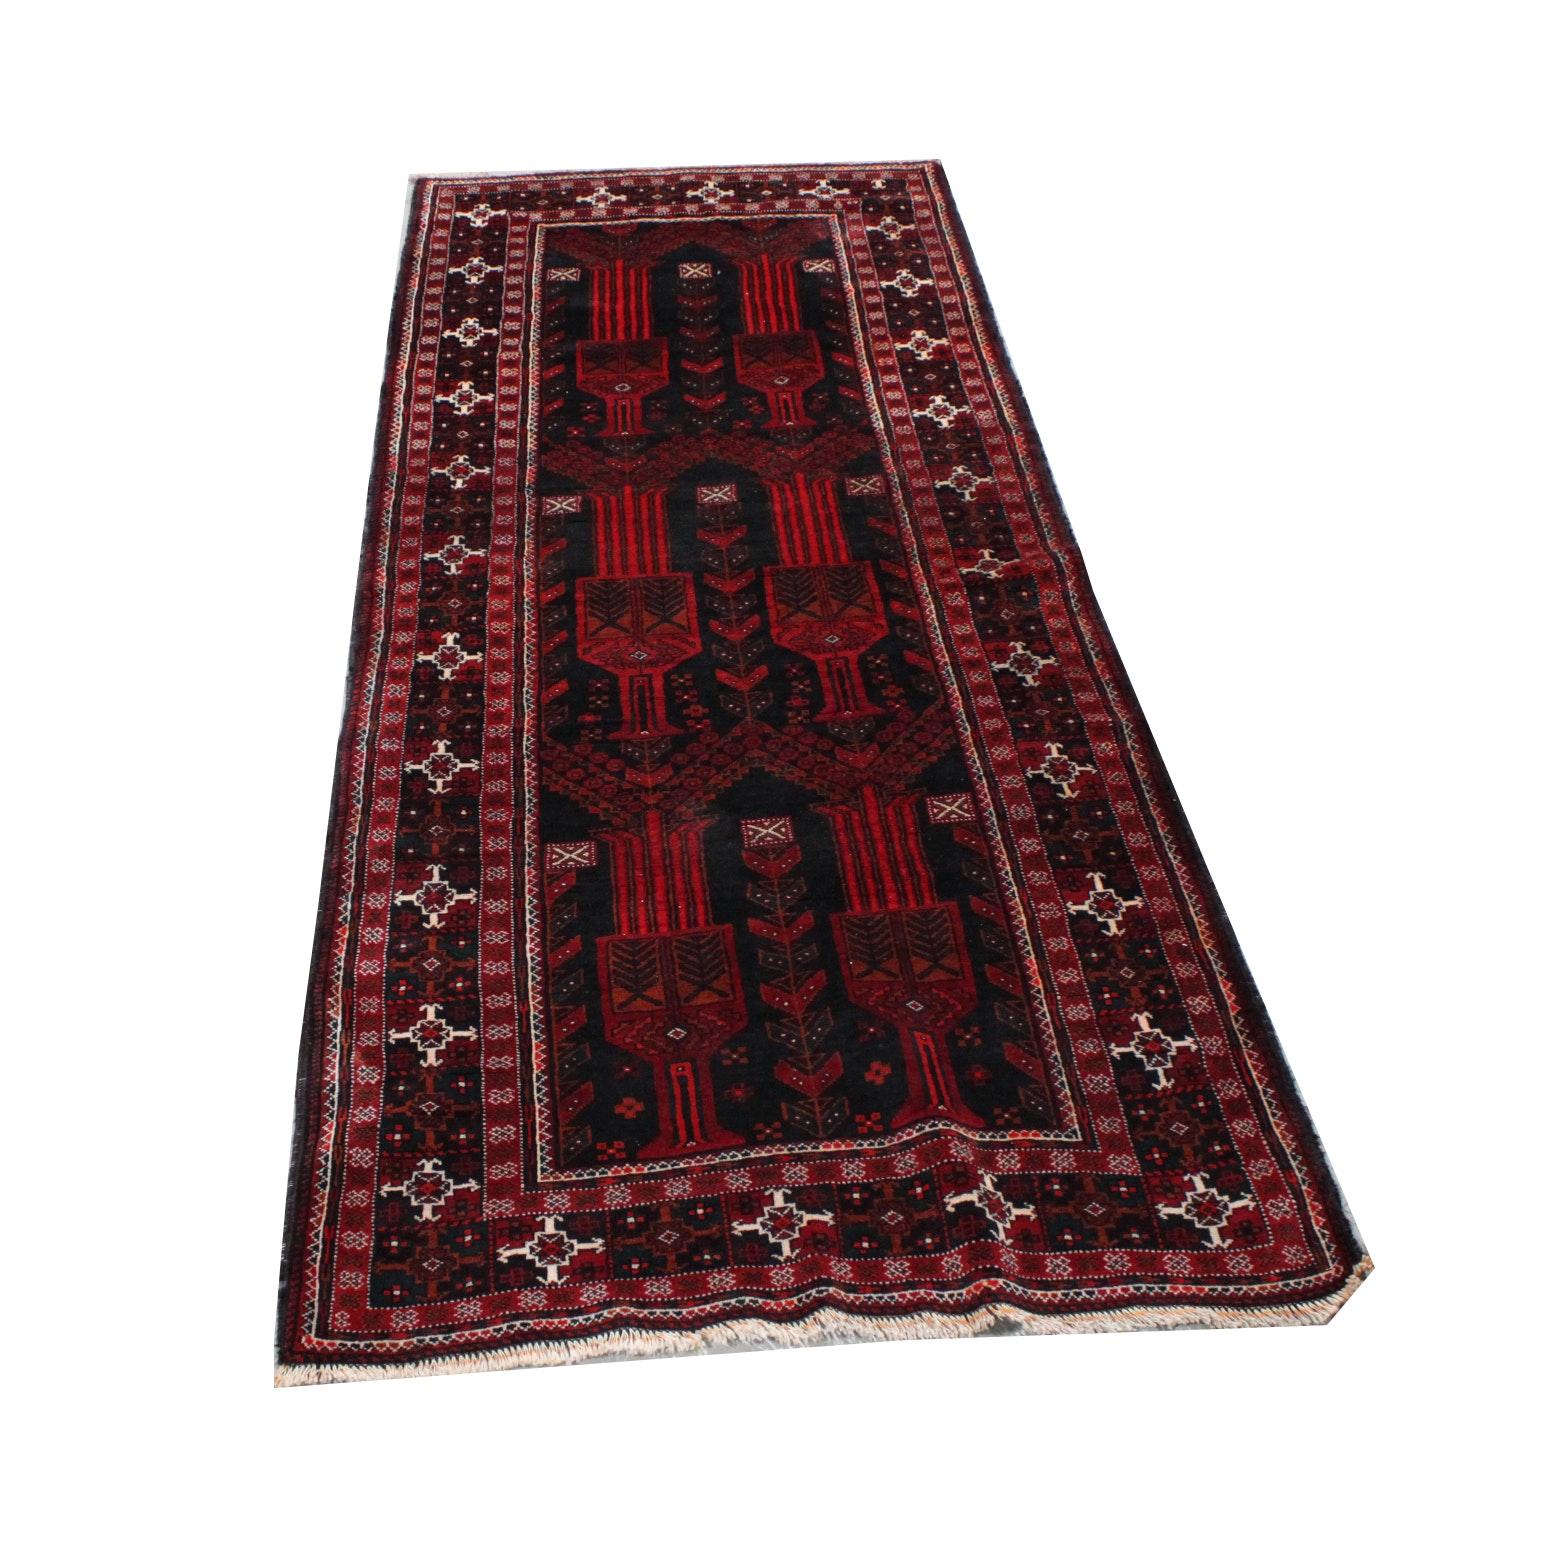 Hand-Knotted Turkmen Carpet Runner